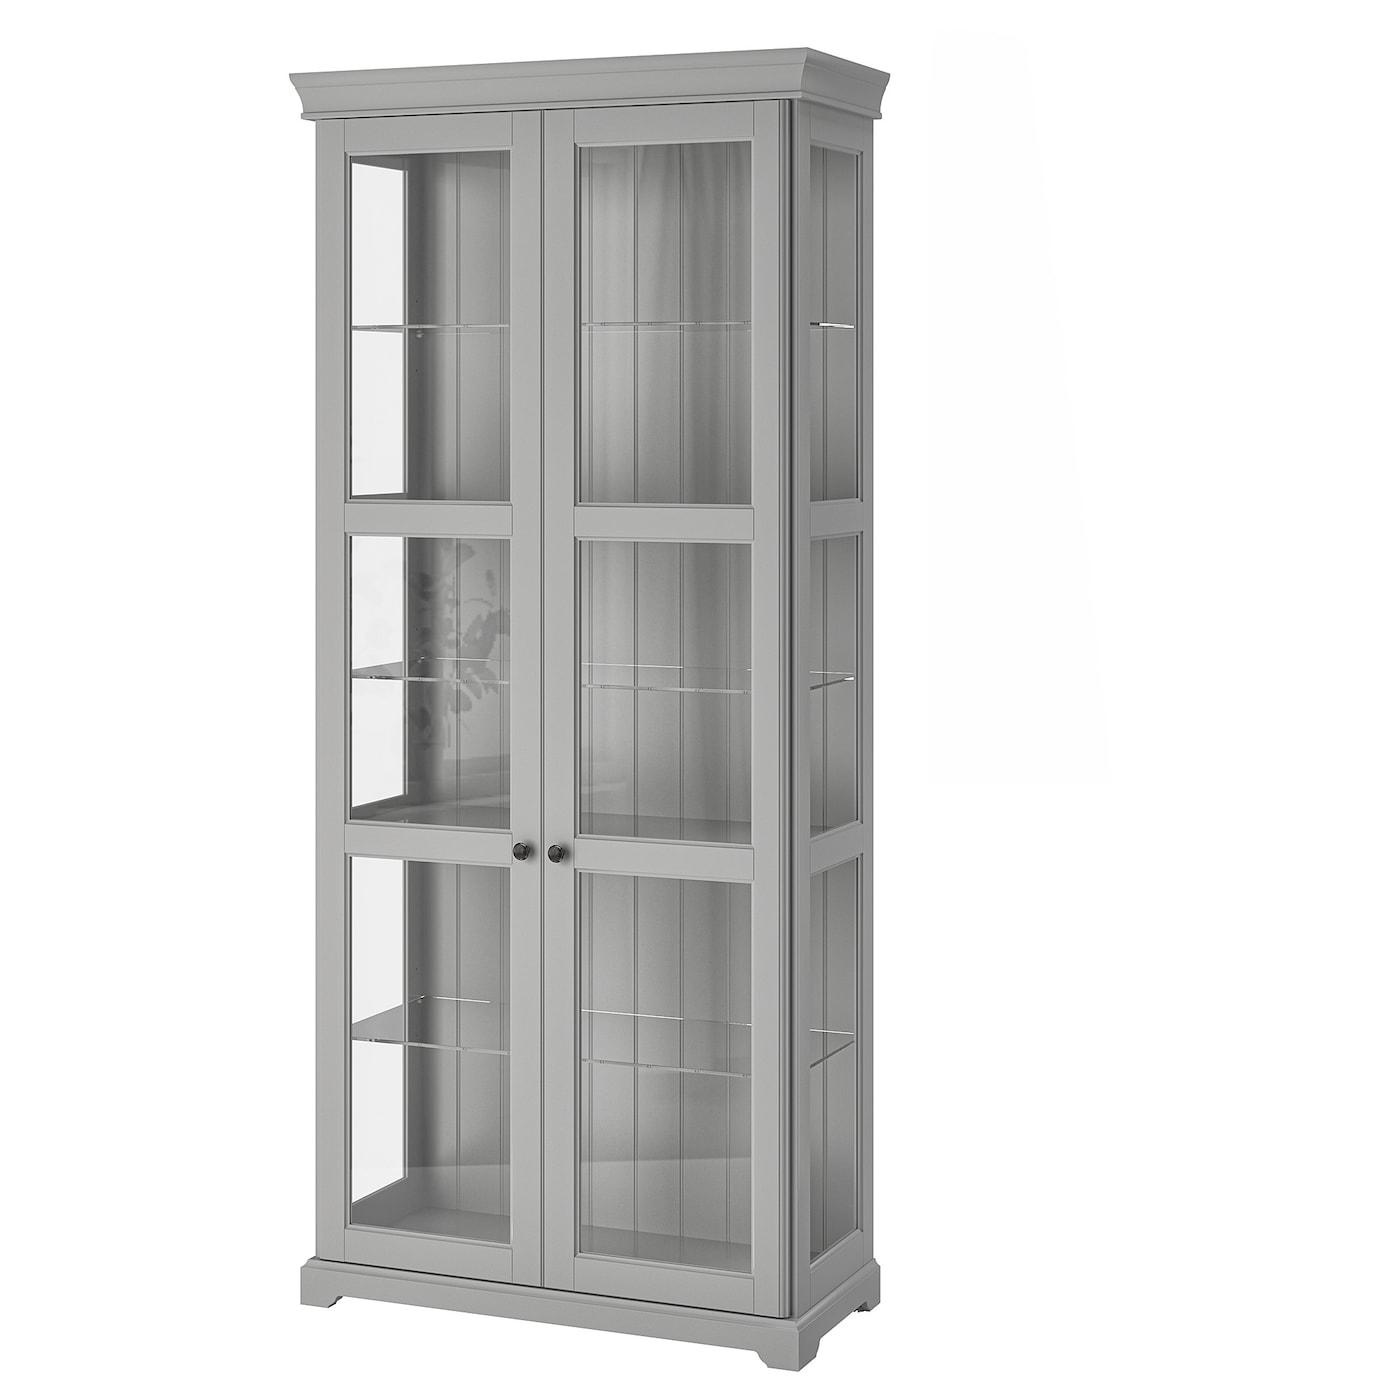 vitrinas muebles para el sal n compra online ikea. Black Bedroom Furniture Sets. Home Design Ideas